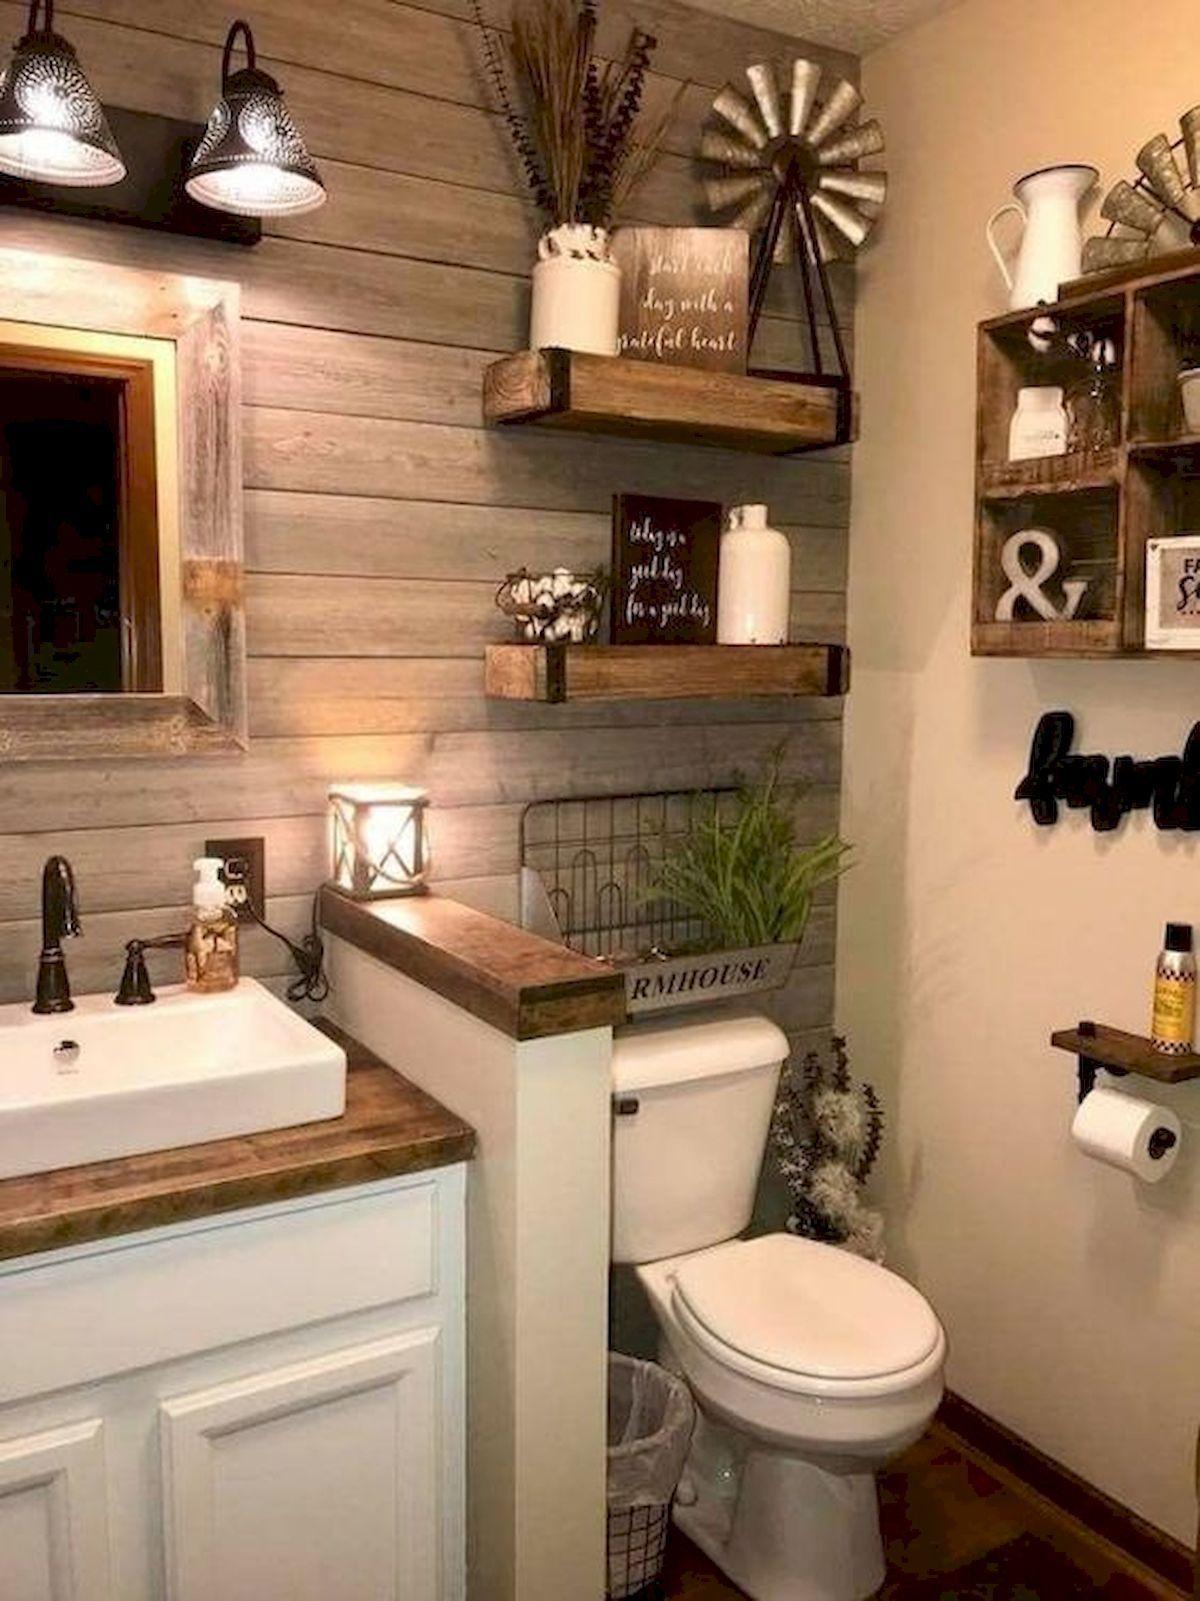 Einzigartige rustikale Home Diy Dekor Ideen | Badezimmer Designs #rusticbathroomdesigns